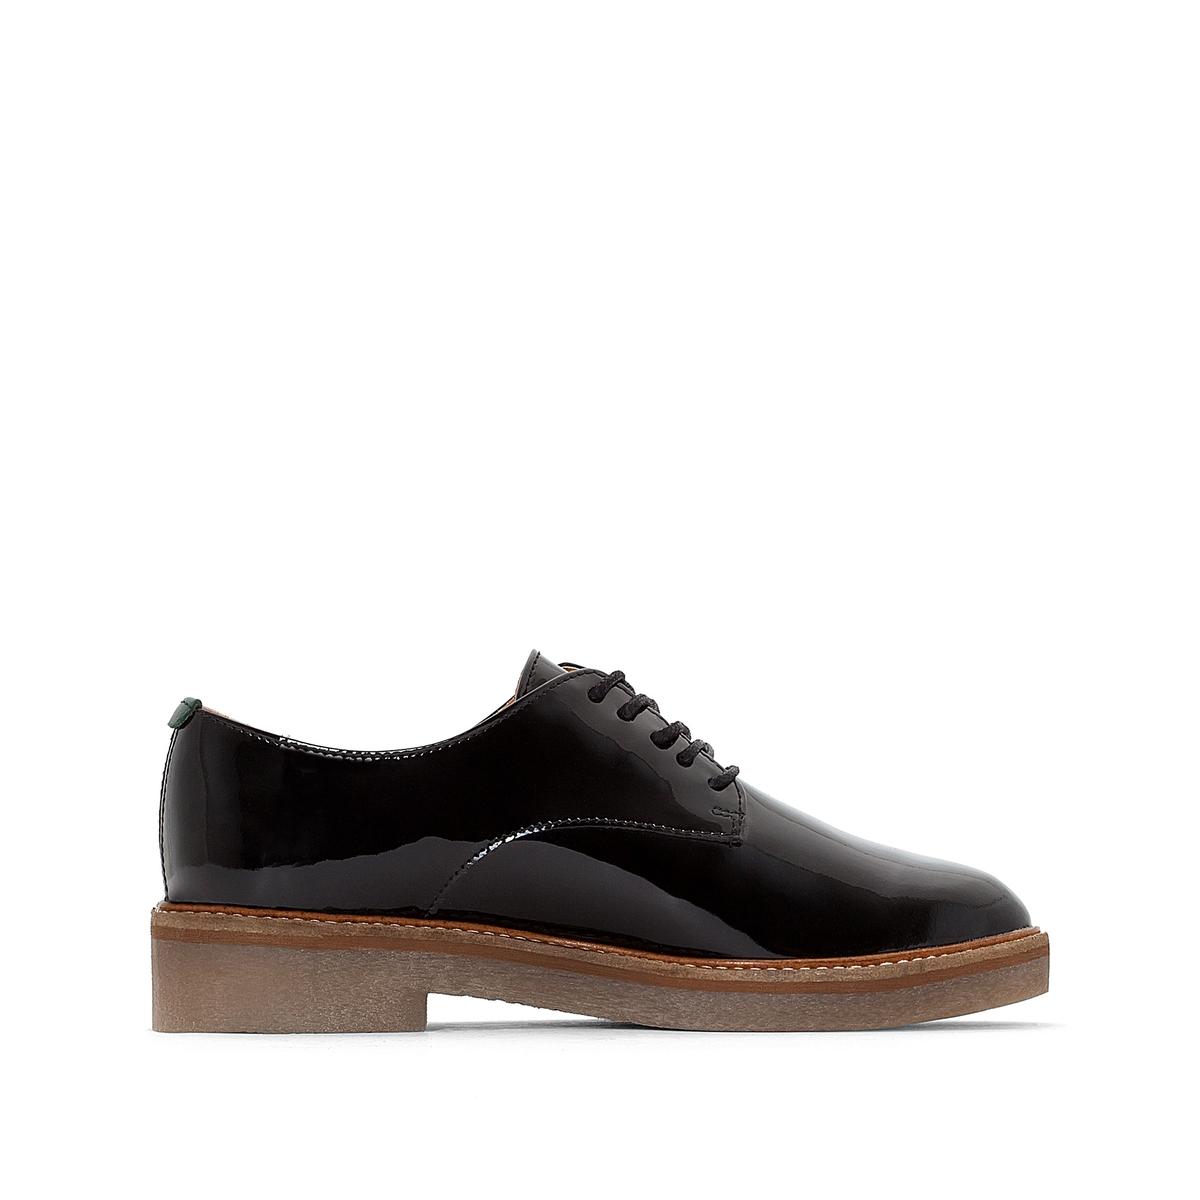 Ботинки-дерби из лакированной кожи OXFORK ботинки дерби из мягкой кожи takarika